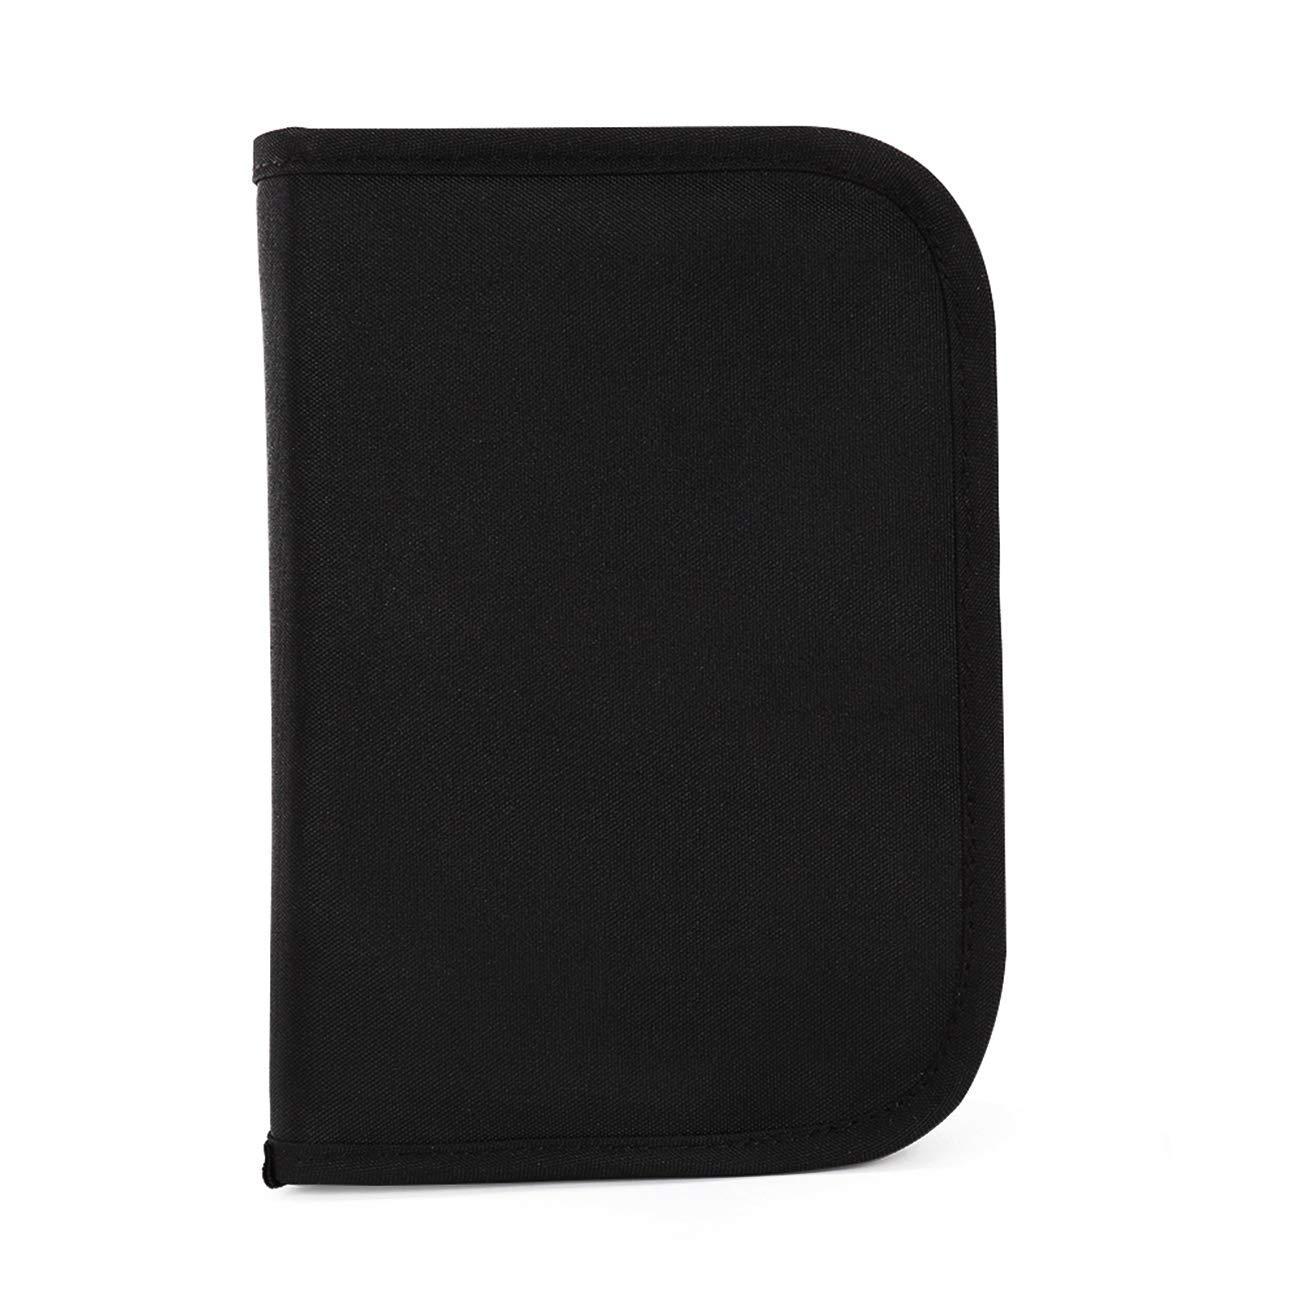 Liveasy Portable Passport Wallet, Travel Document Organizer, Passport Bag, Cash Holder, Credit Card Purse, Made with Durable Waterproof Nylon Fabric